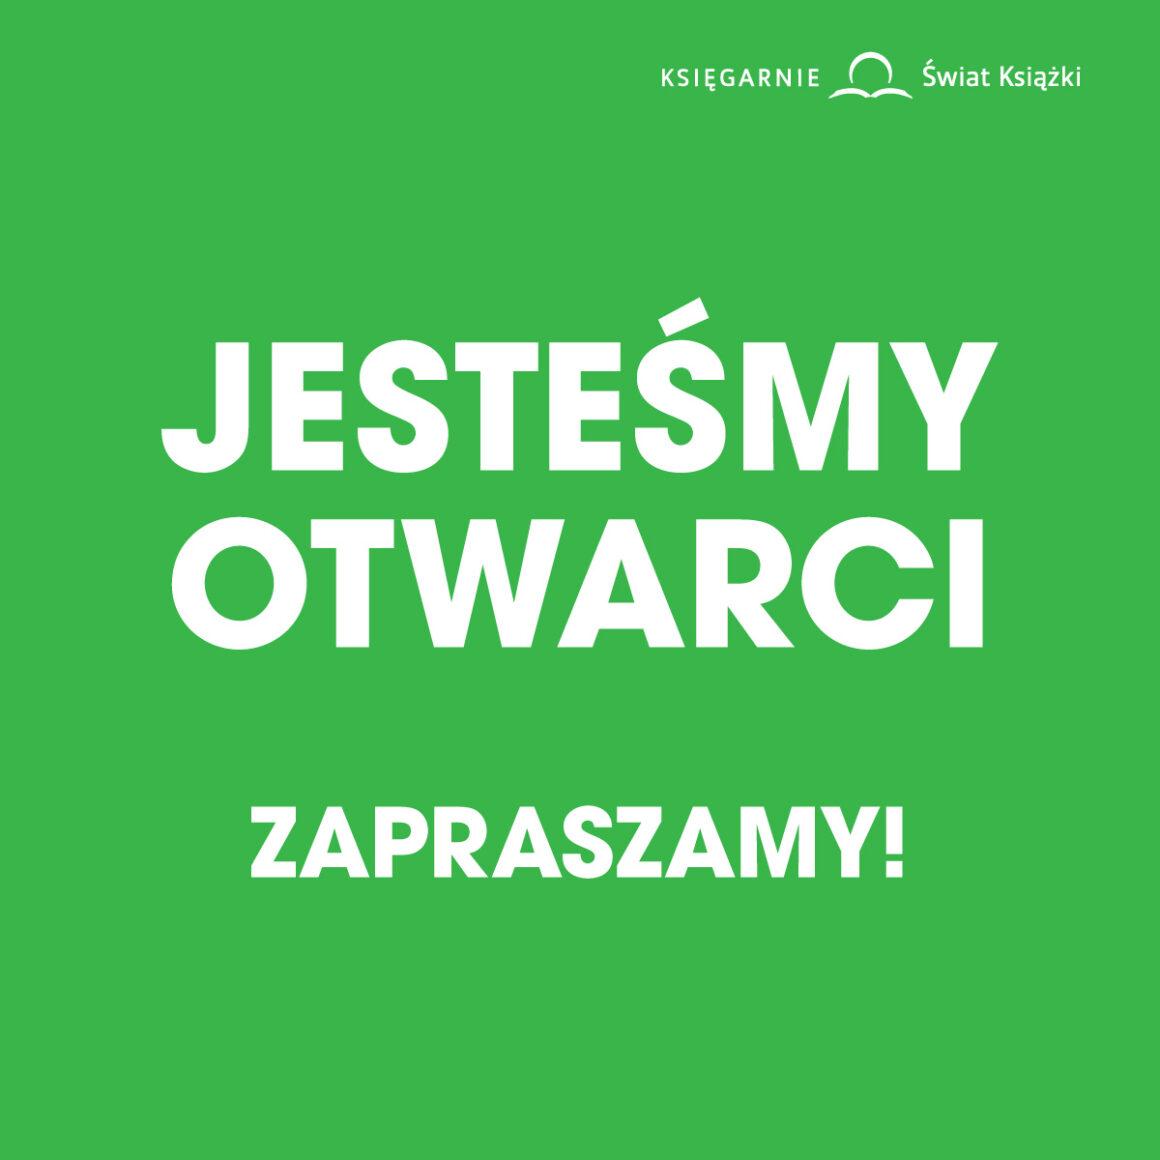 Księgarnia Świat Książki otwarta!